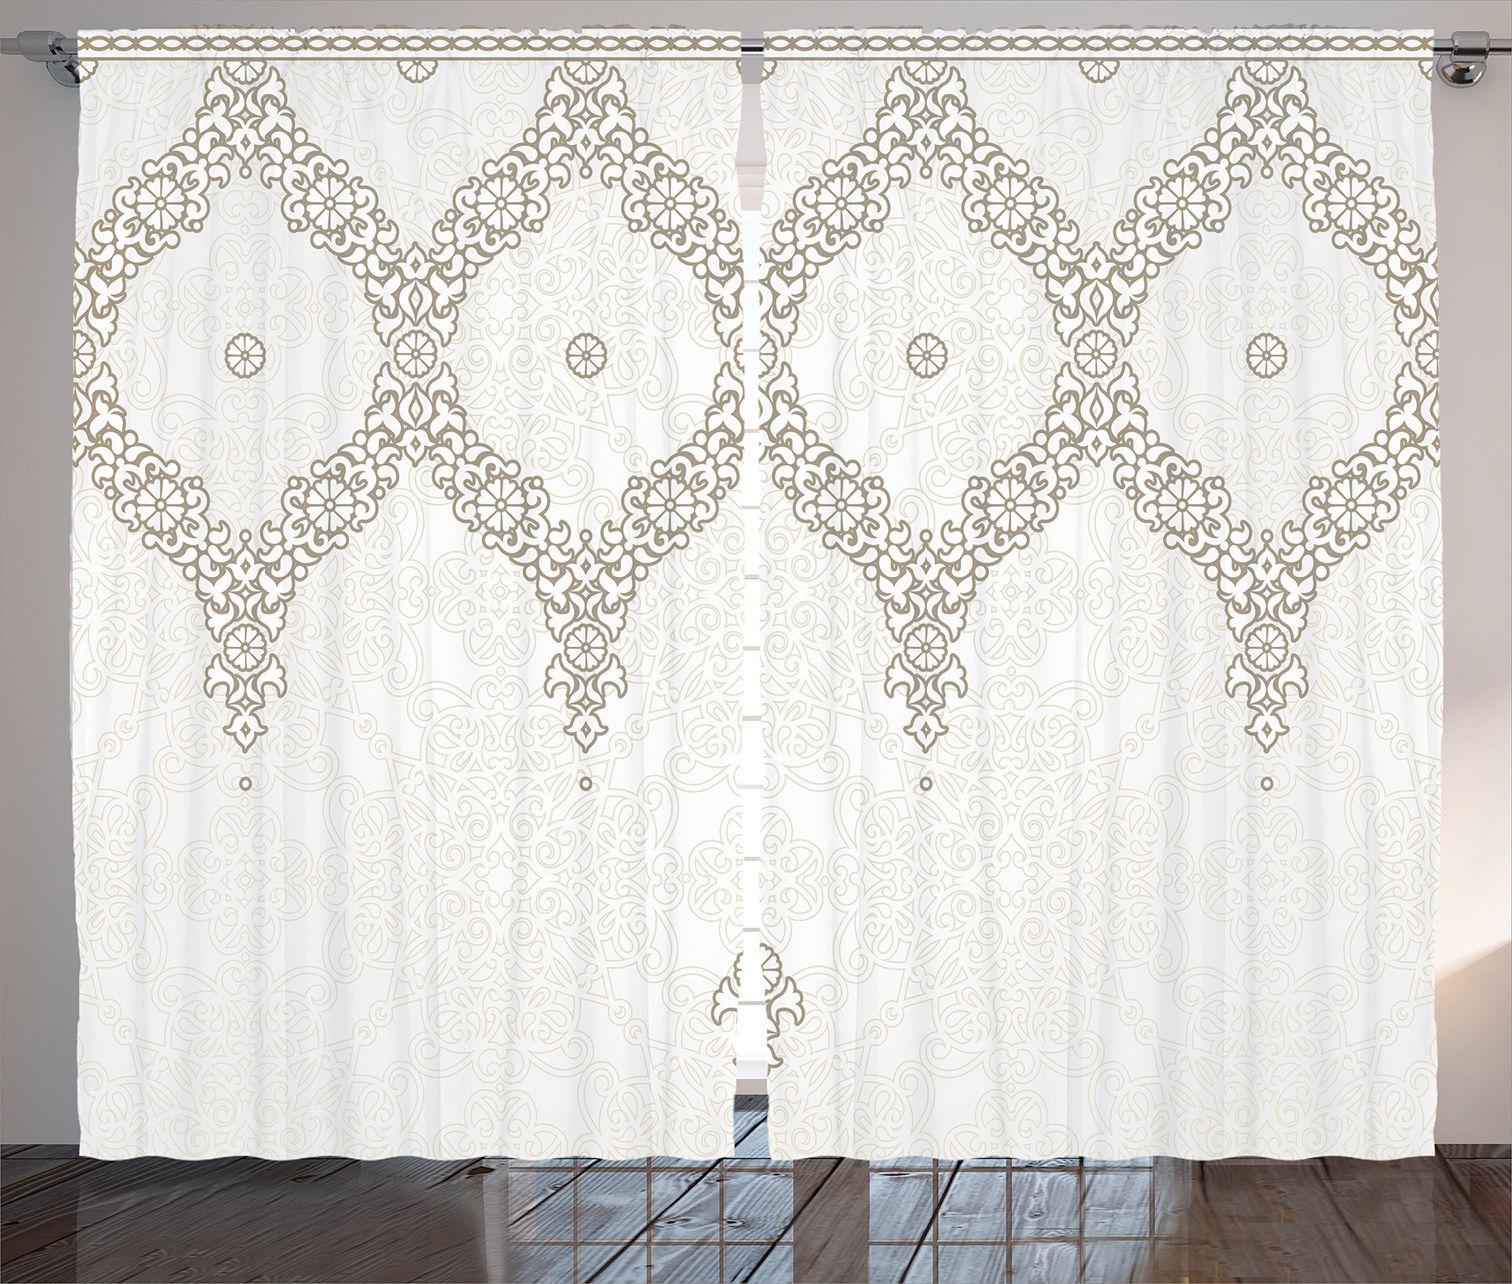 Decorative Ornate Pattern Moroccan Theme Far Eastern Print Curtain 2 Panels Set Ebay